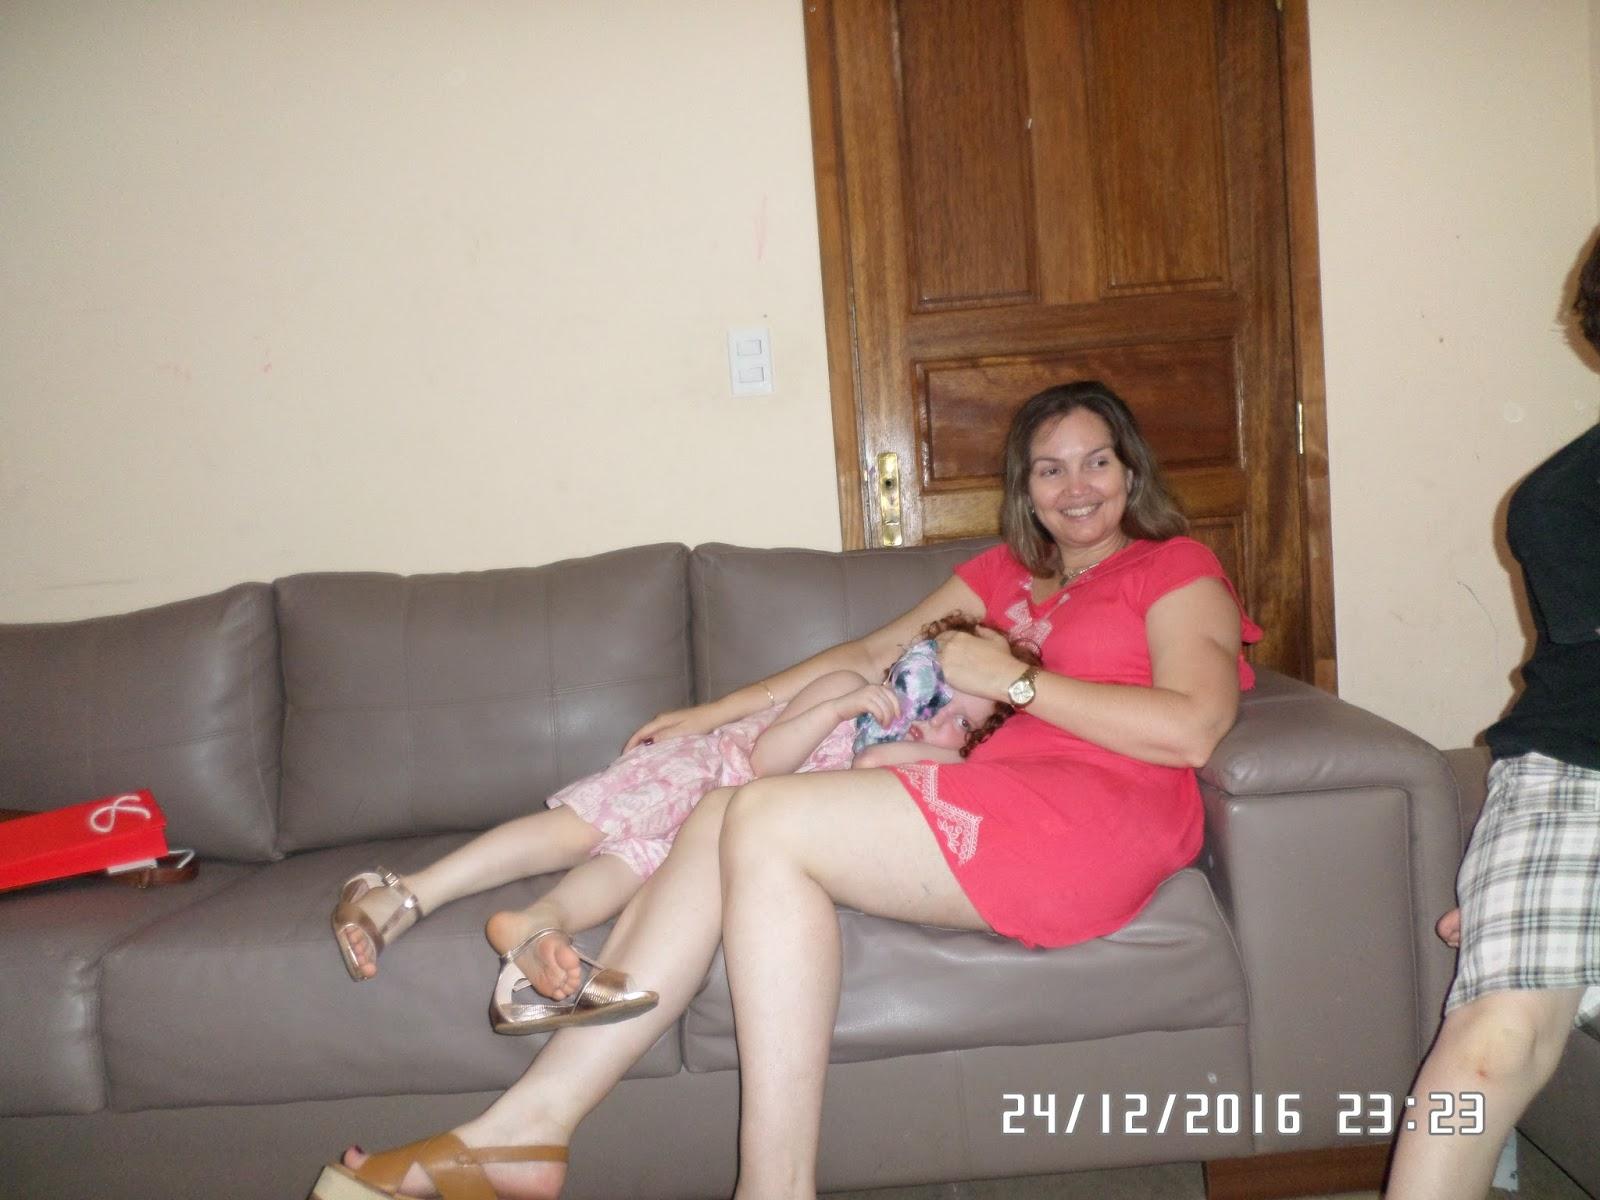 Pamela saez y sus nalgas celuliticas en mexico parte 2 7